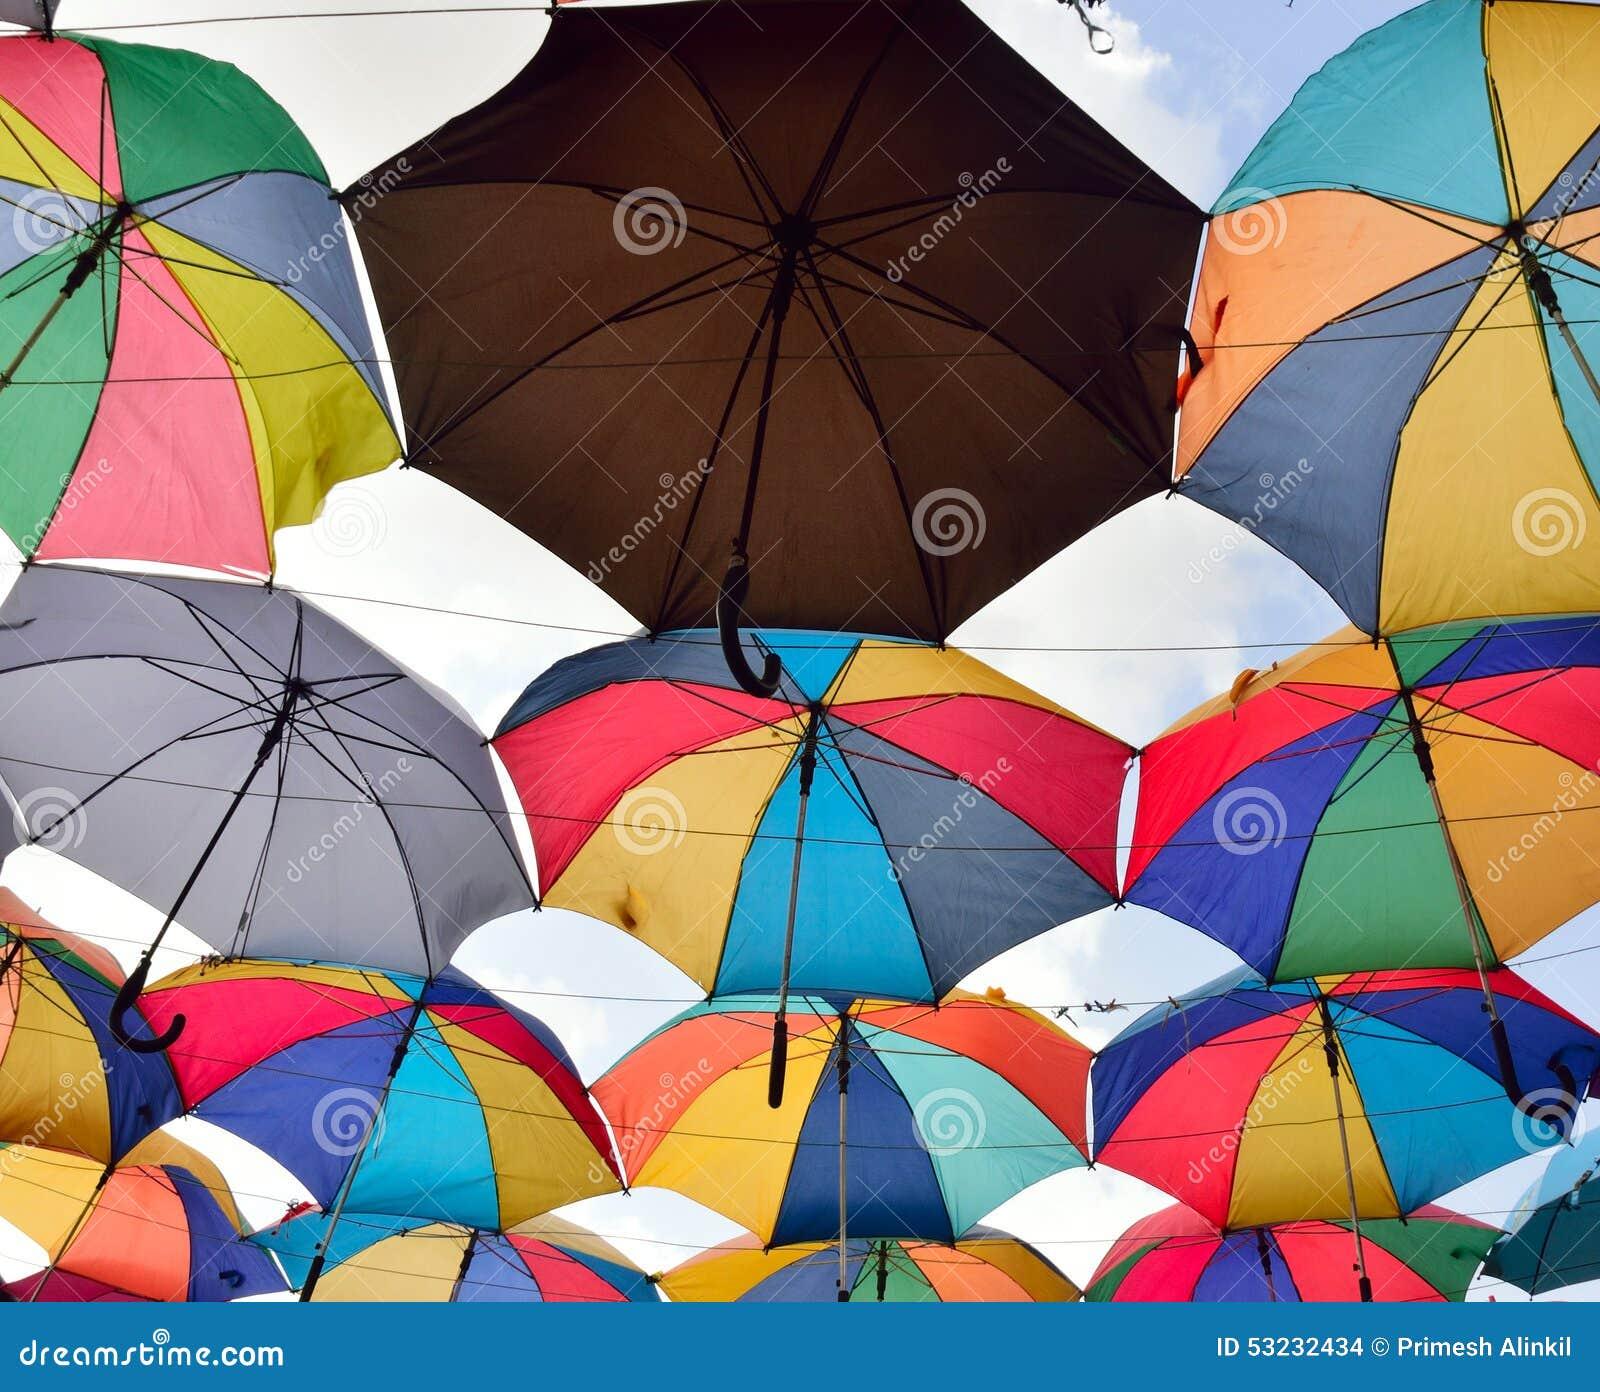 Colorful Umbrella Roof In Miracle Garden Stock Photo - Image 53232434 & umbrella roof - Roof memphite.com